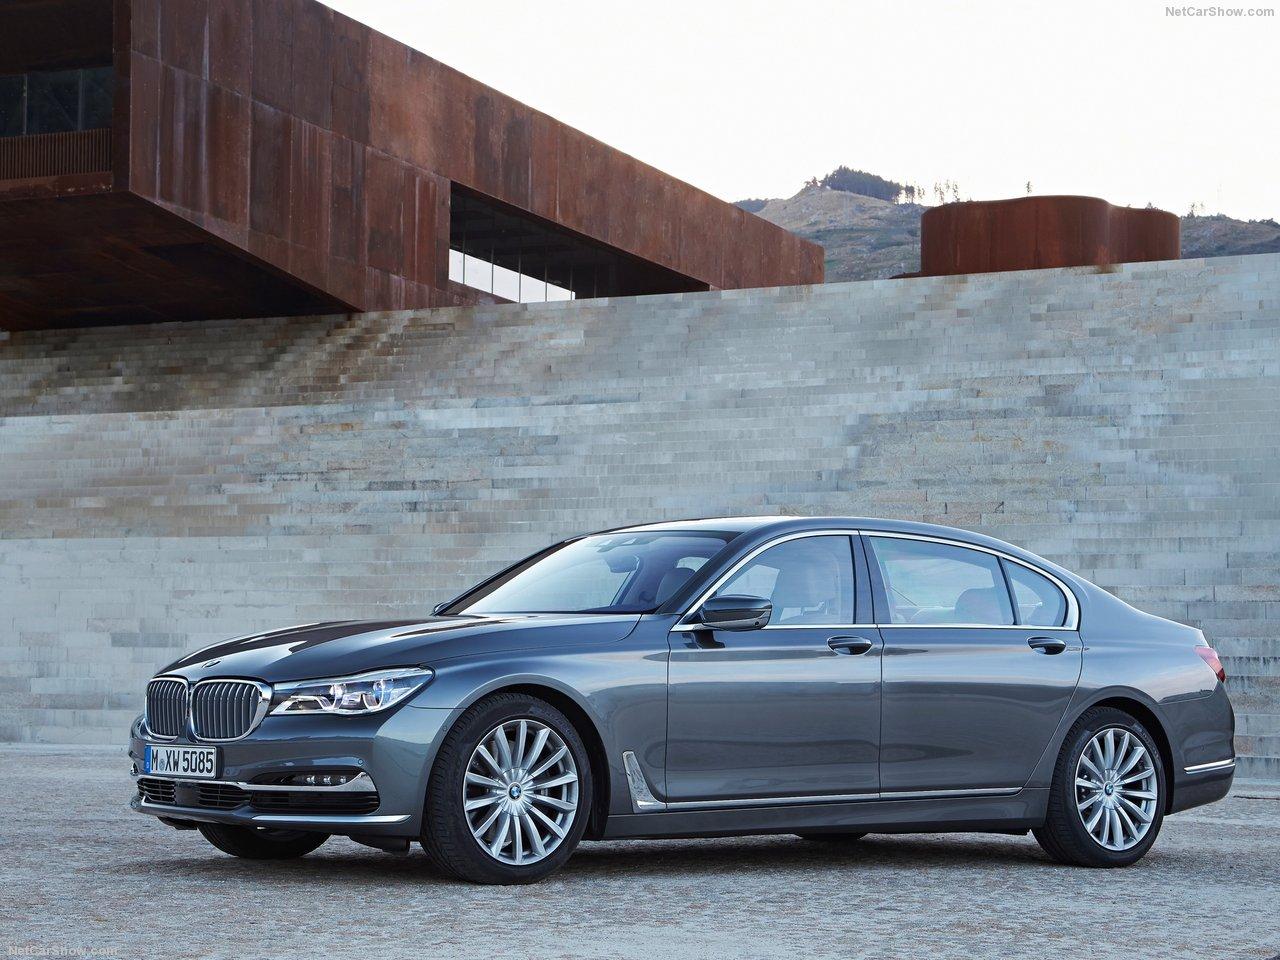 latest model BMW 750Li xDrive